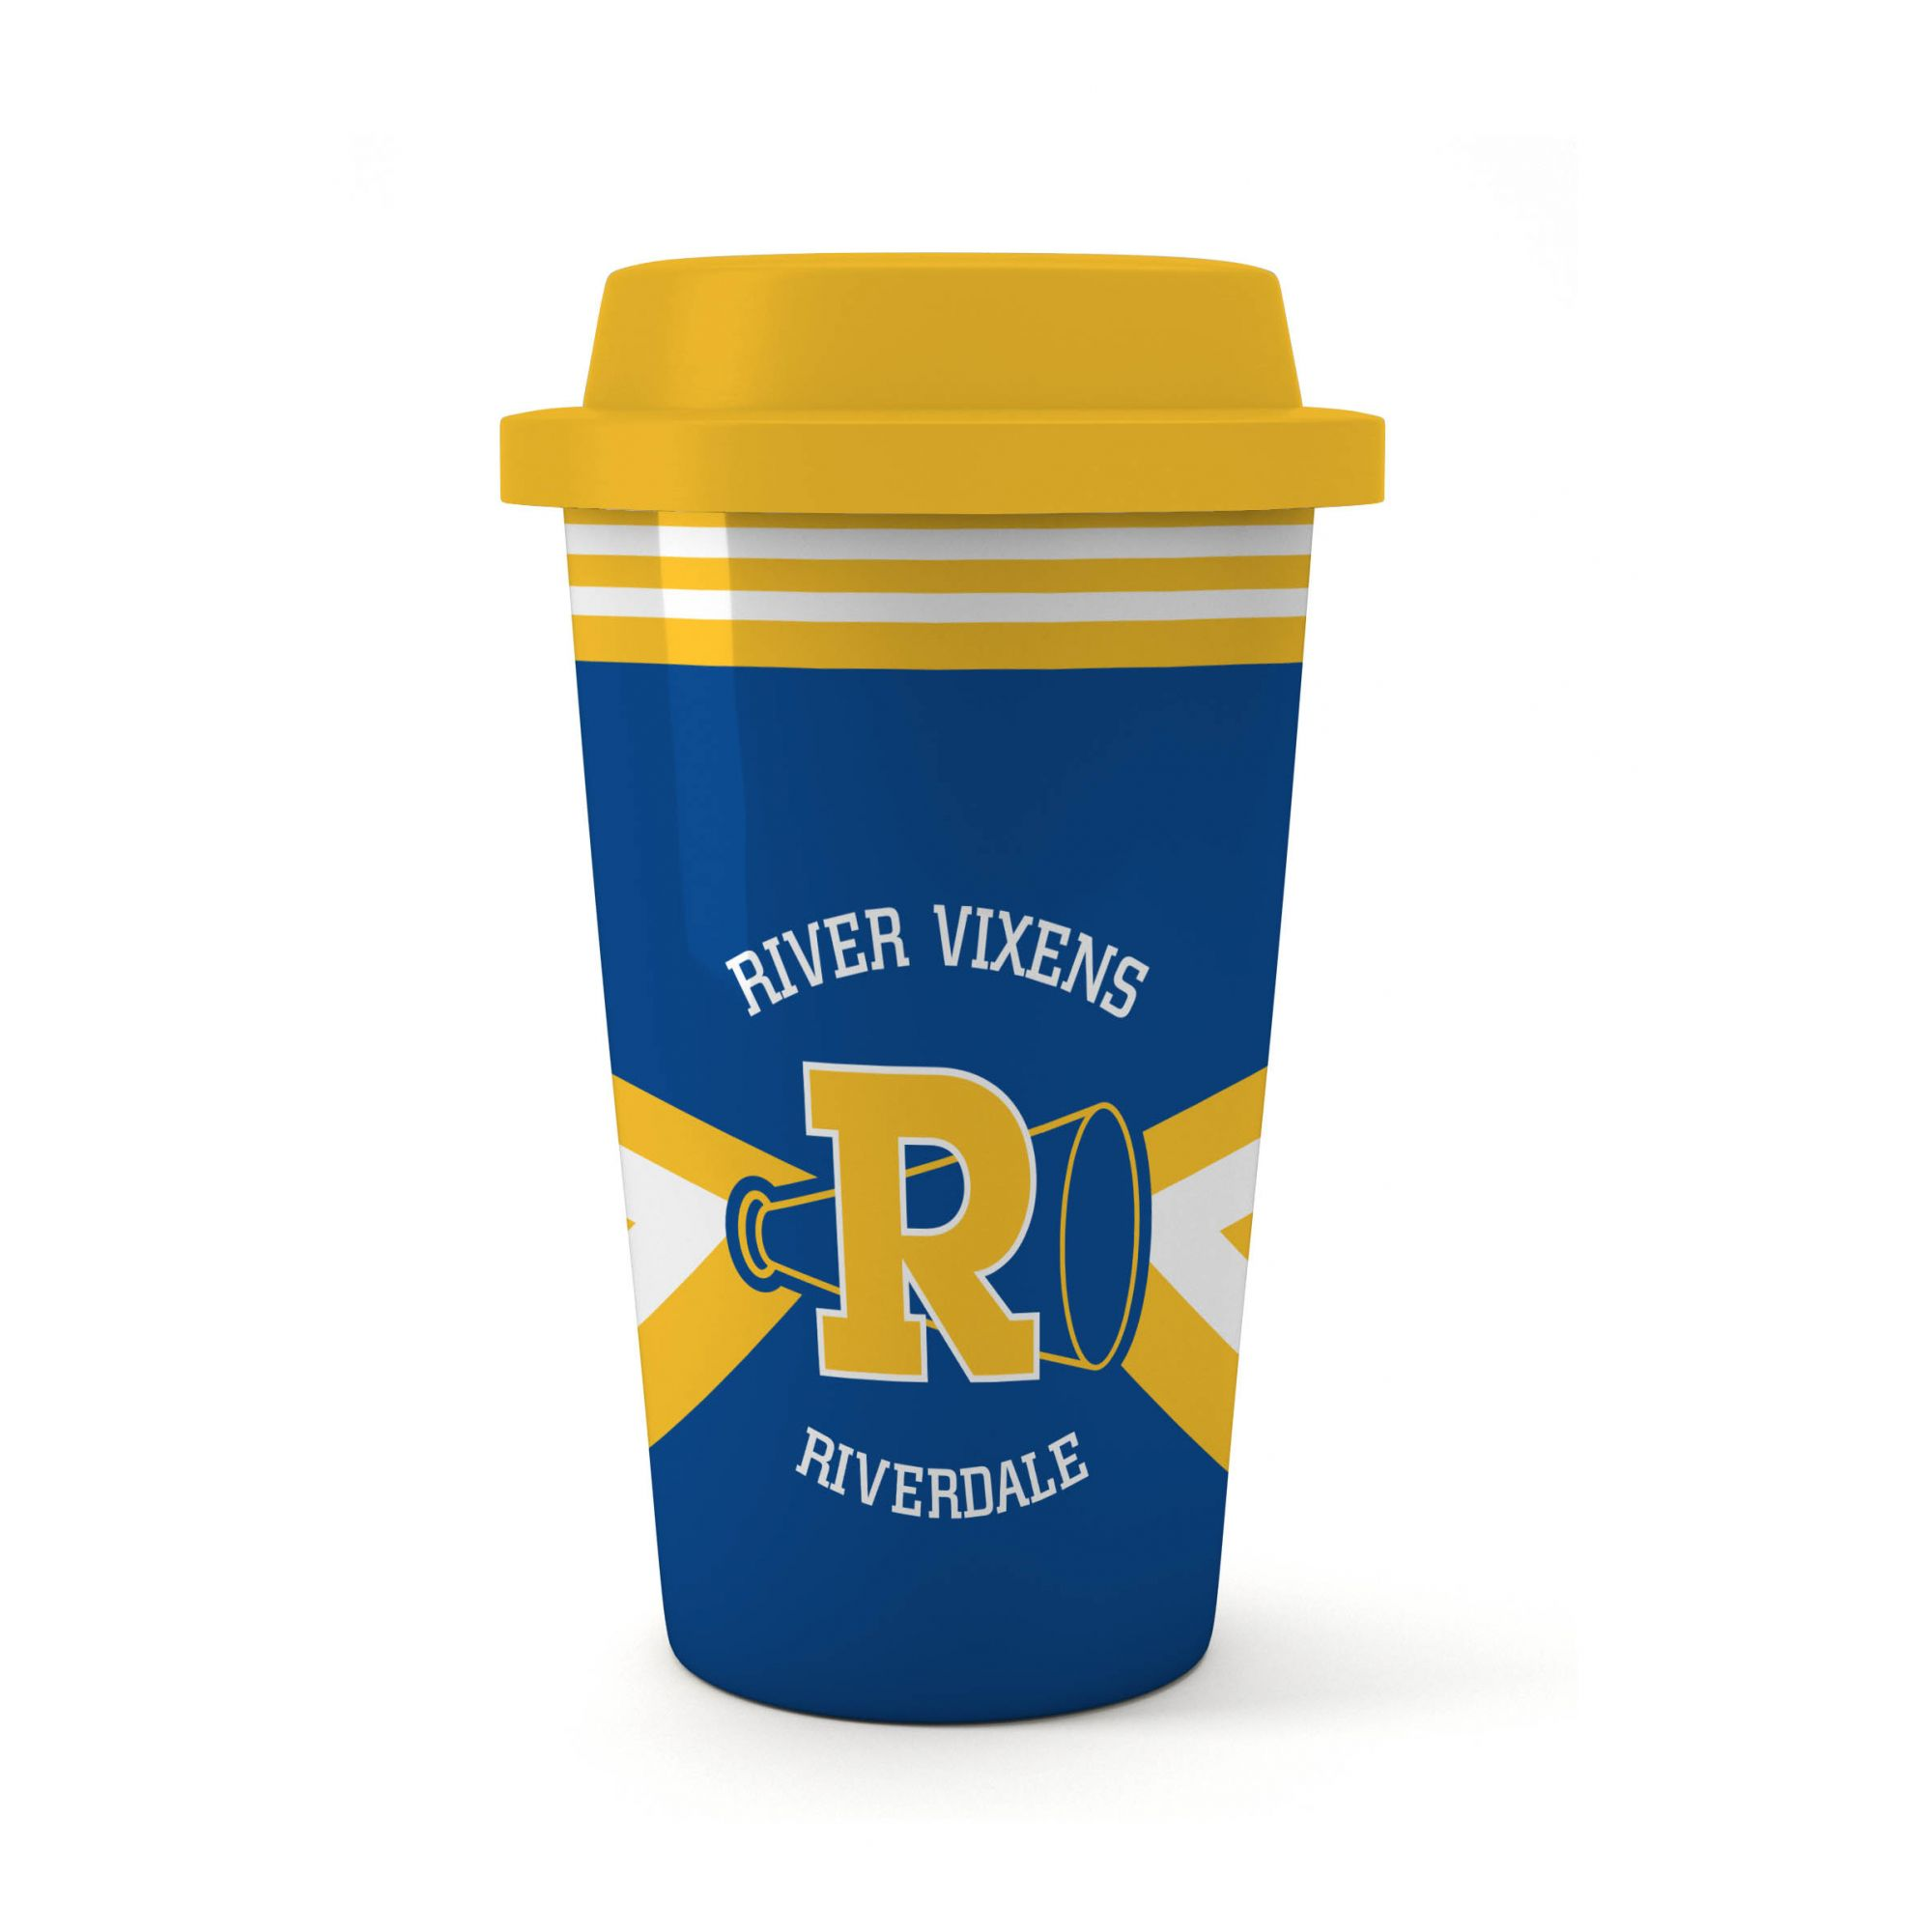 Copo Plástico Riven Vixens: Riverdale 500ml - Urban